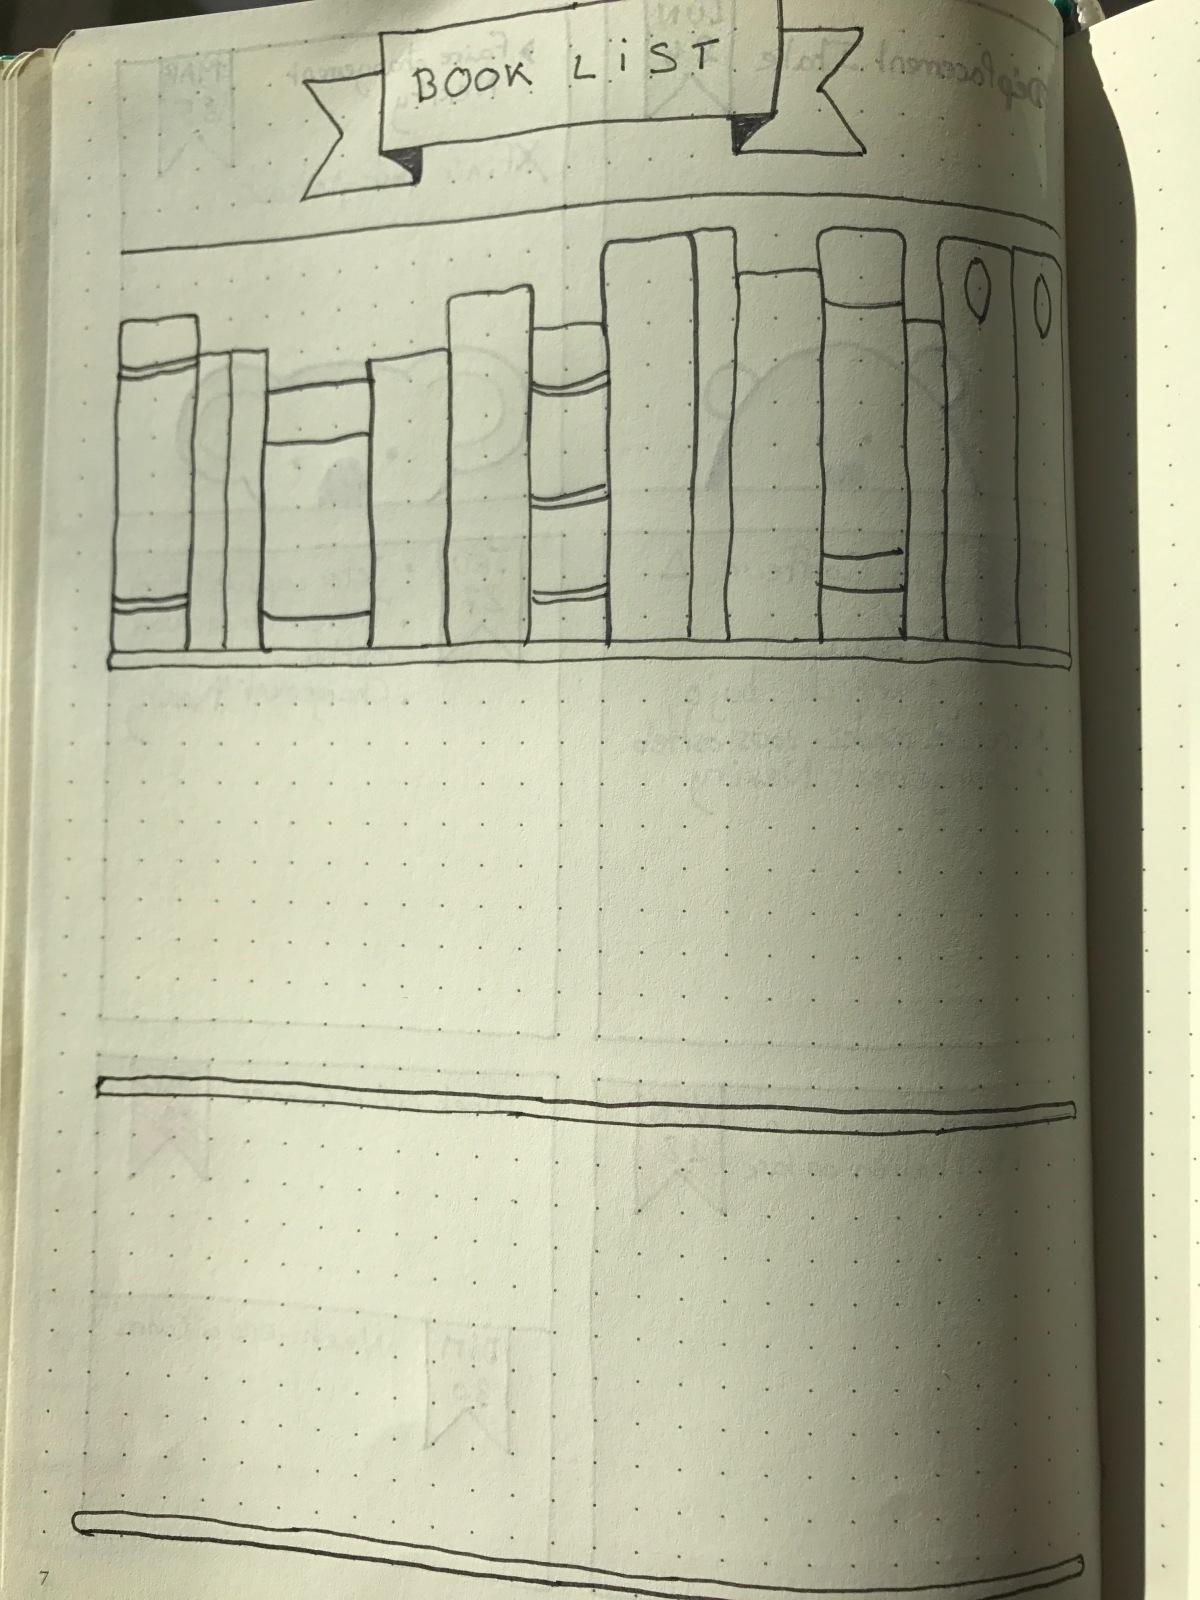 bullet journal book list collection